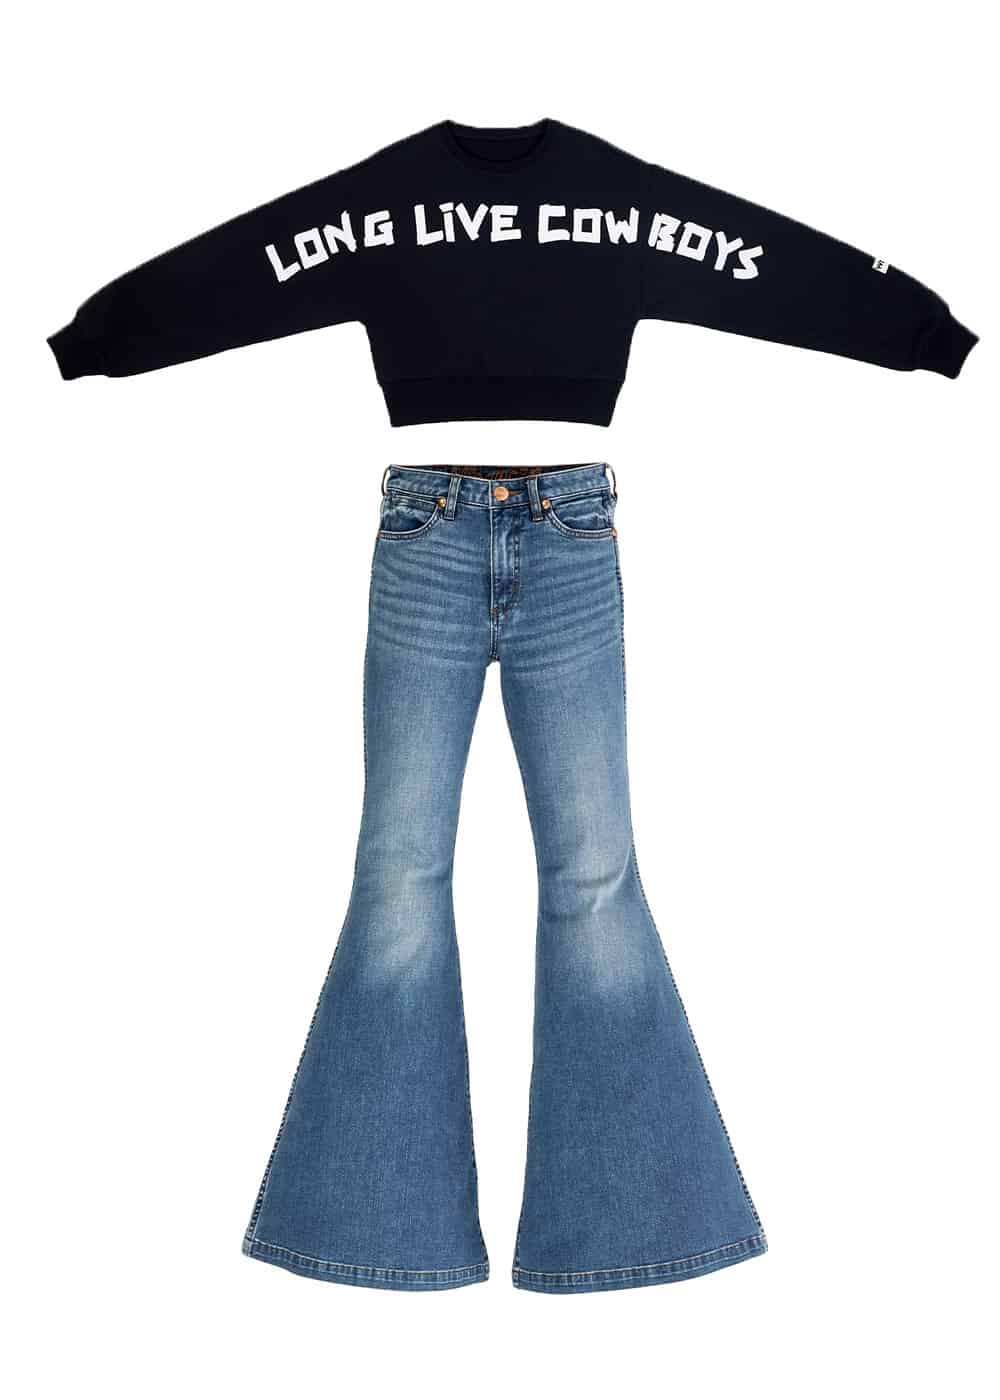 wrangler jeans cowgirl magazine